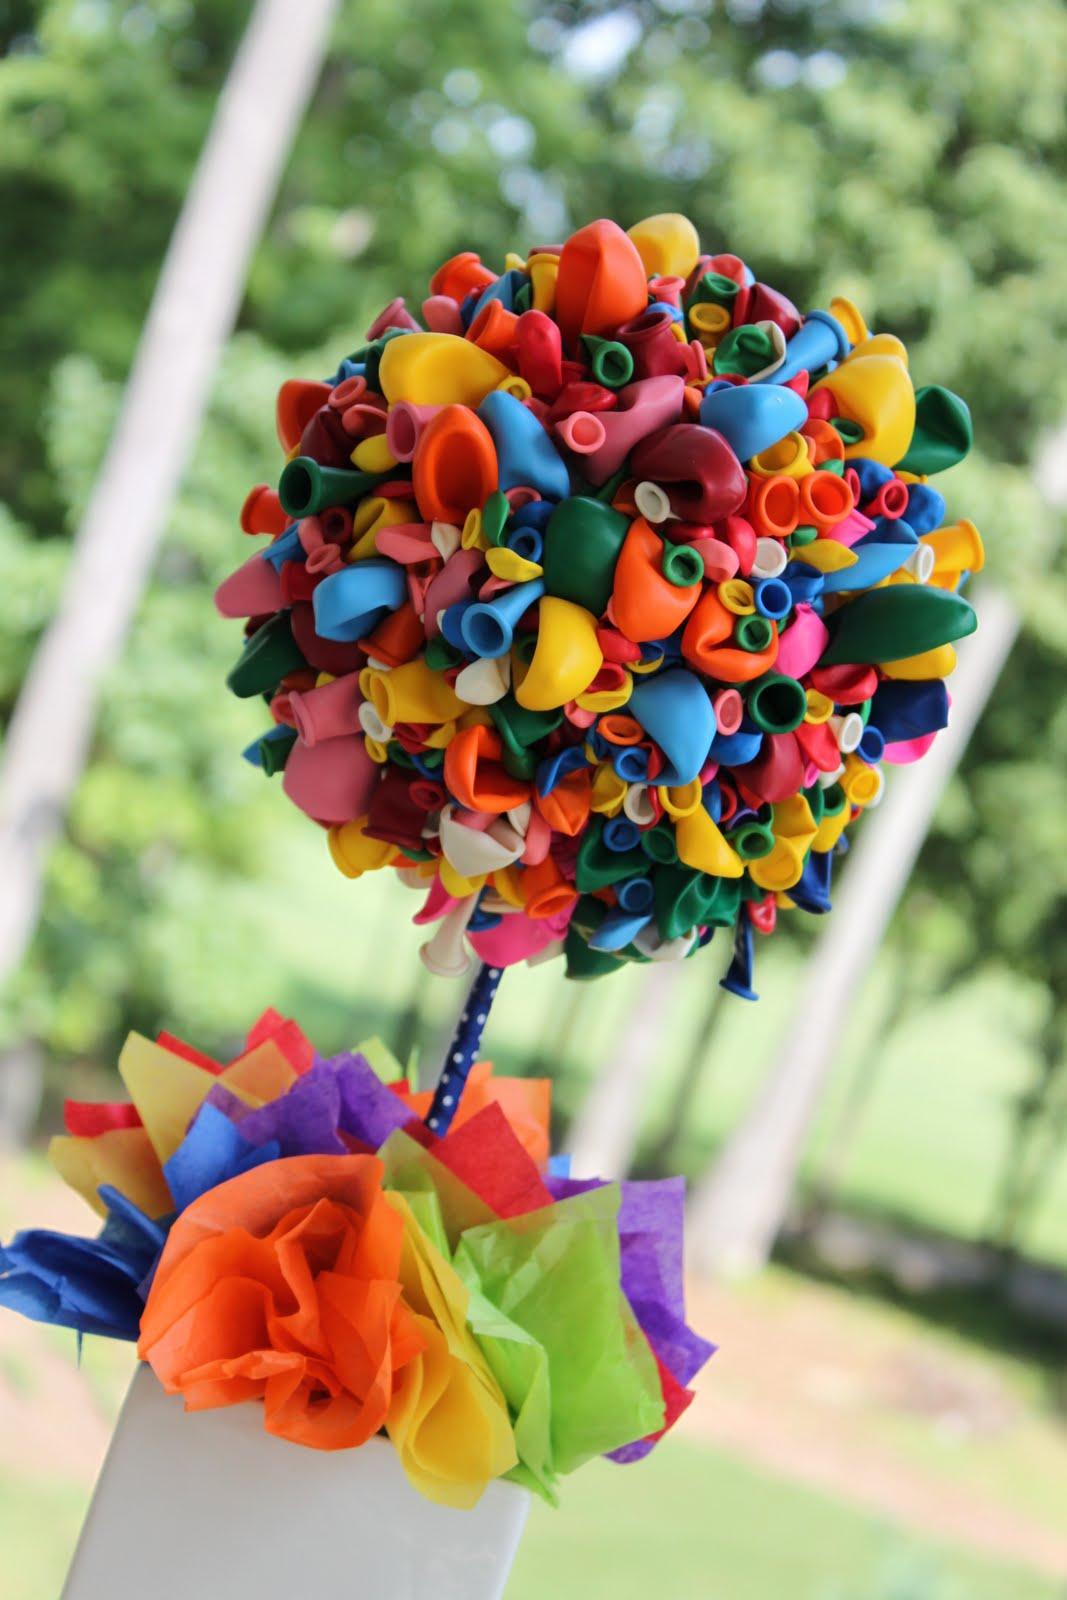 45+ Fun and Creative Ways to Use Balloons --> Balloon Topiary